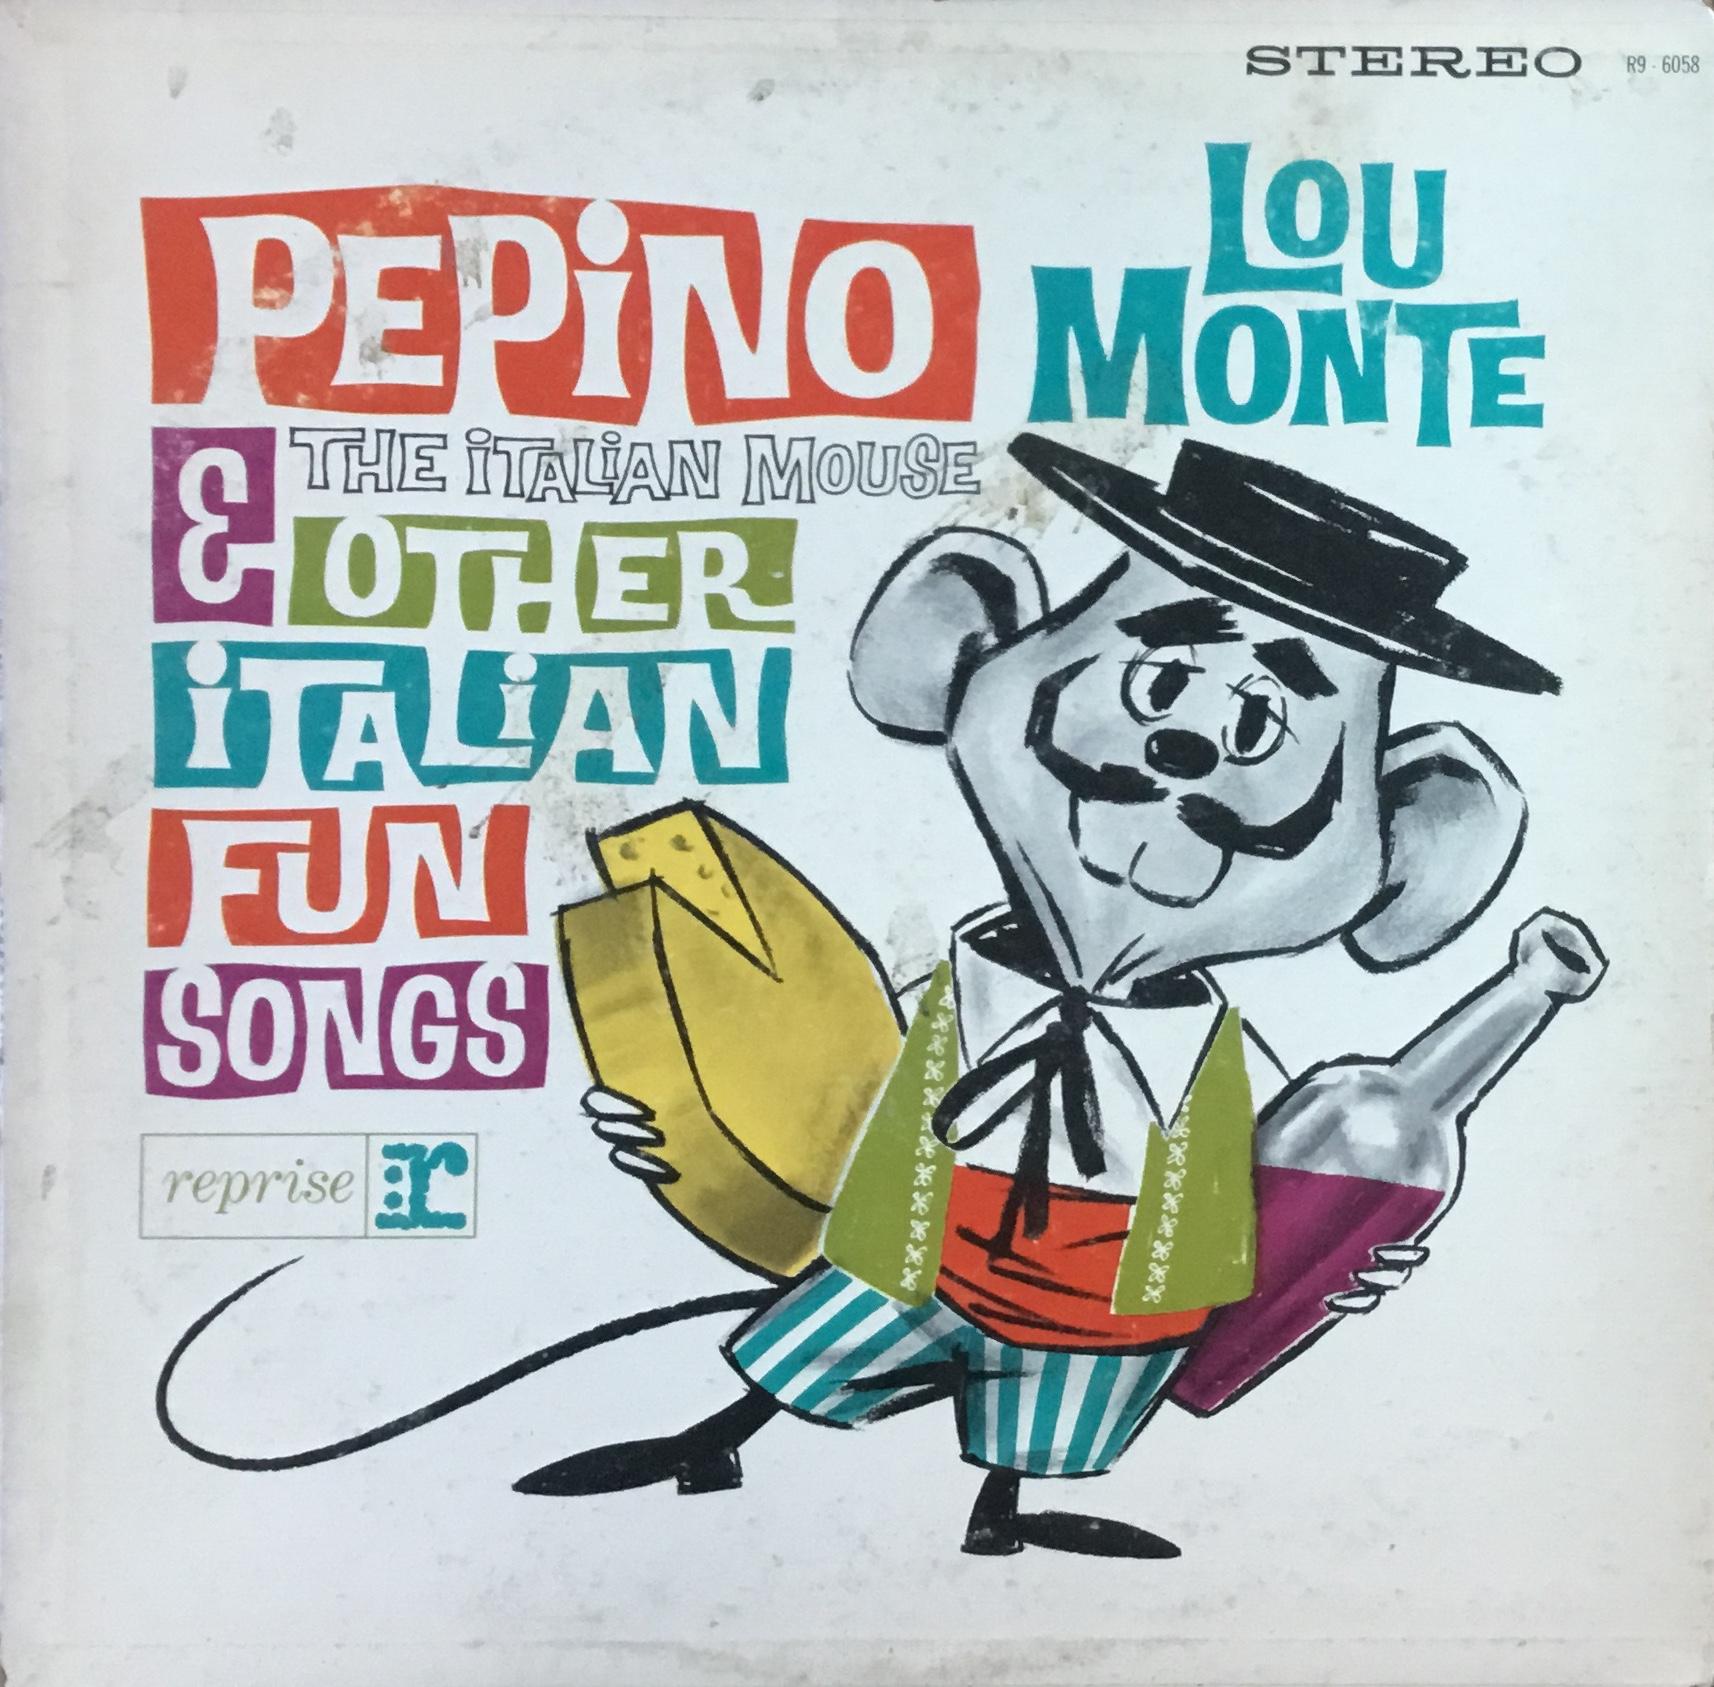 LouMonte_Pepino